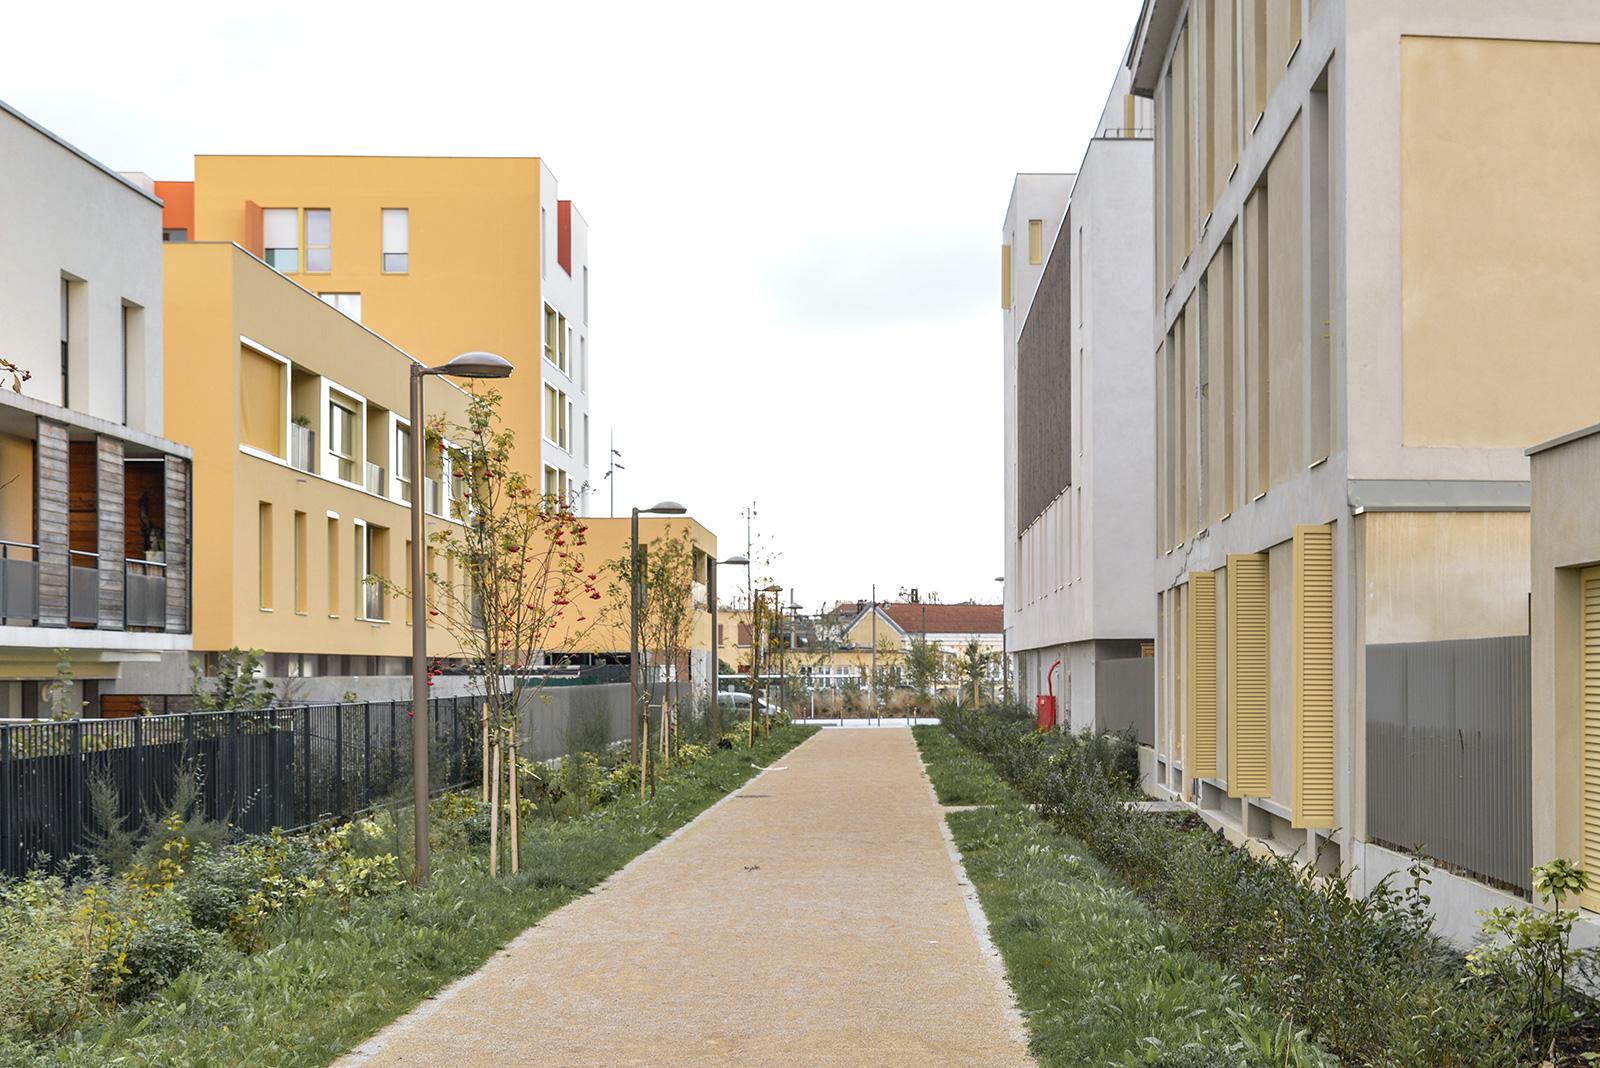 10-germe-et-jam-bretigny-clause-bois-badeau-projet-urbain--ALLEE